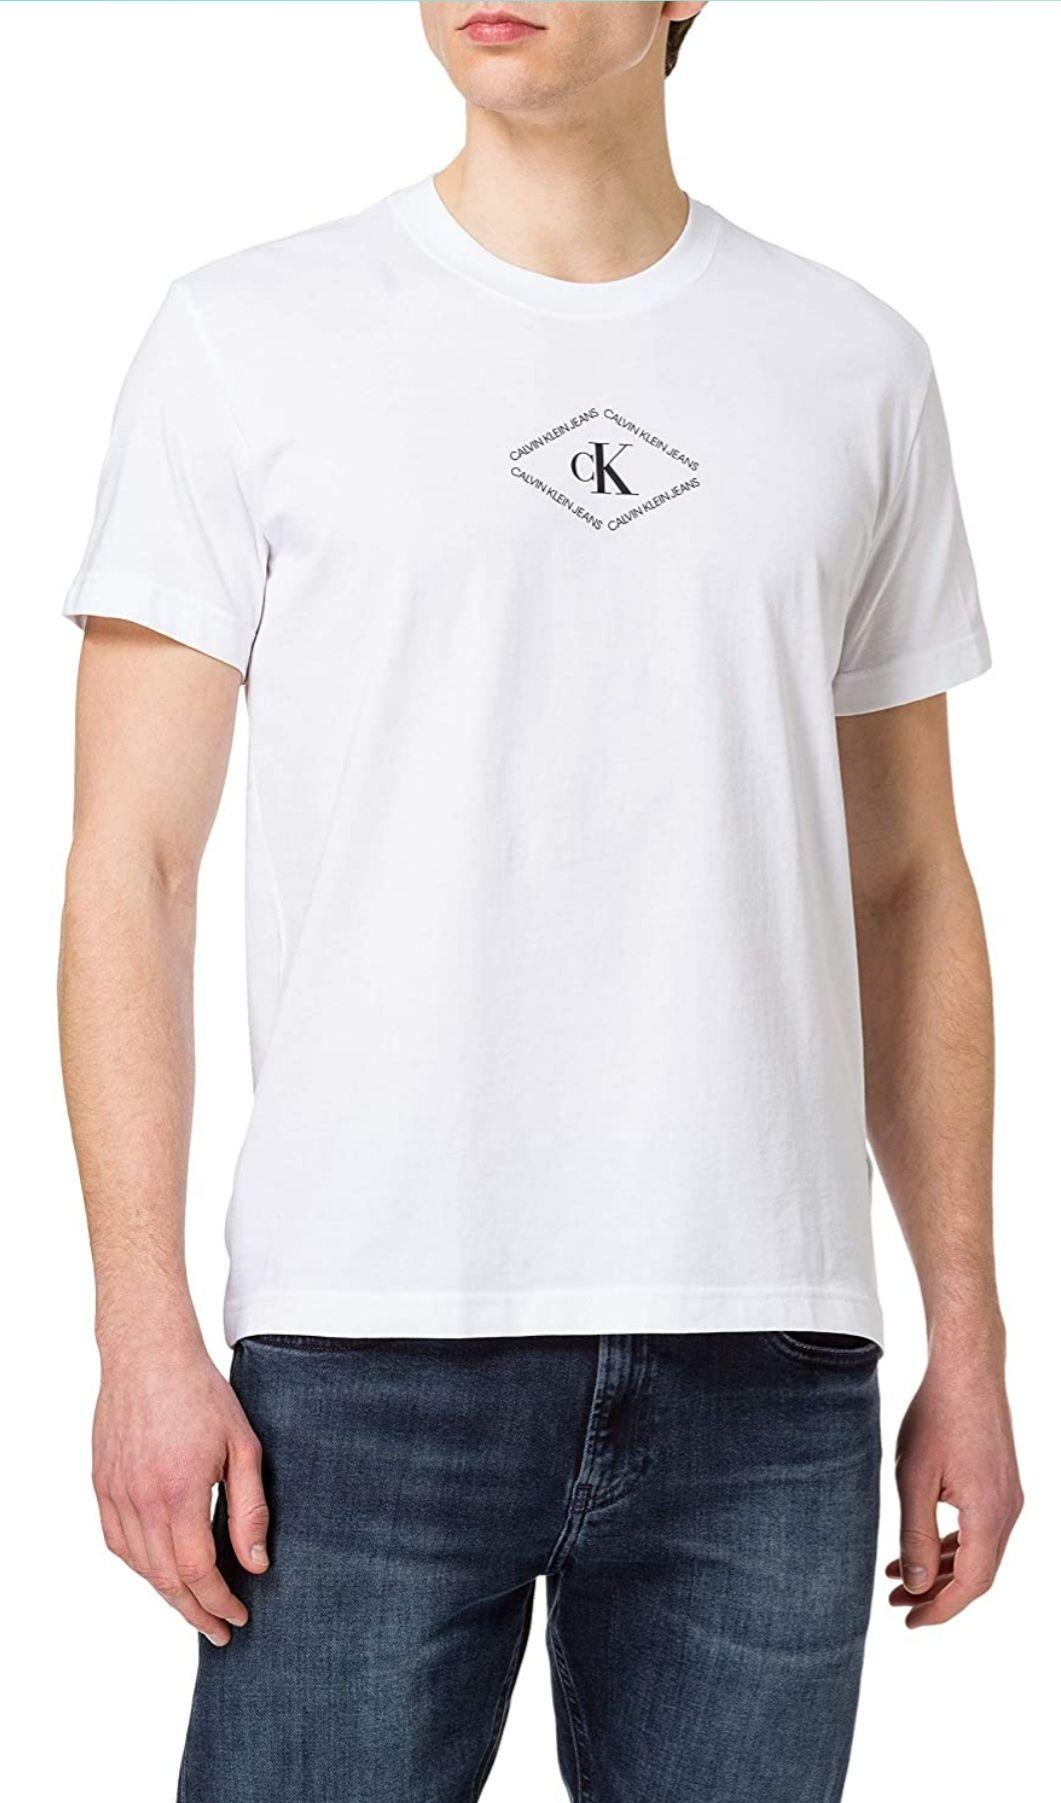 Camiseta Calvin Klein hombre - L